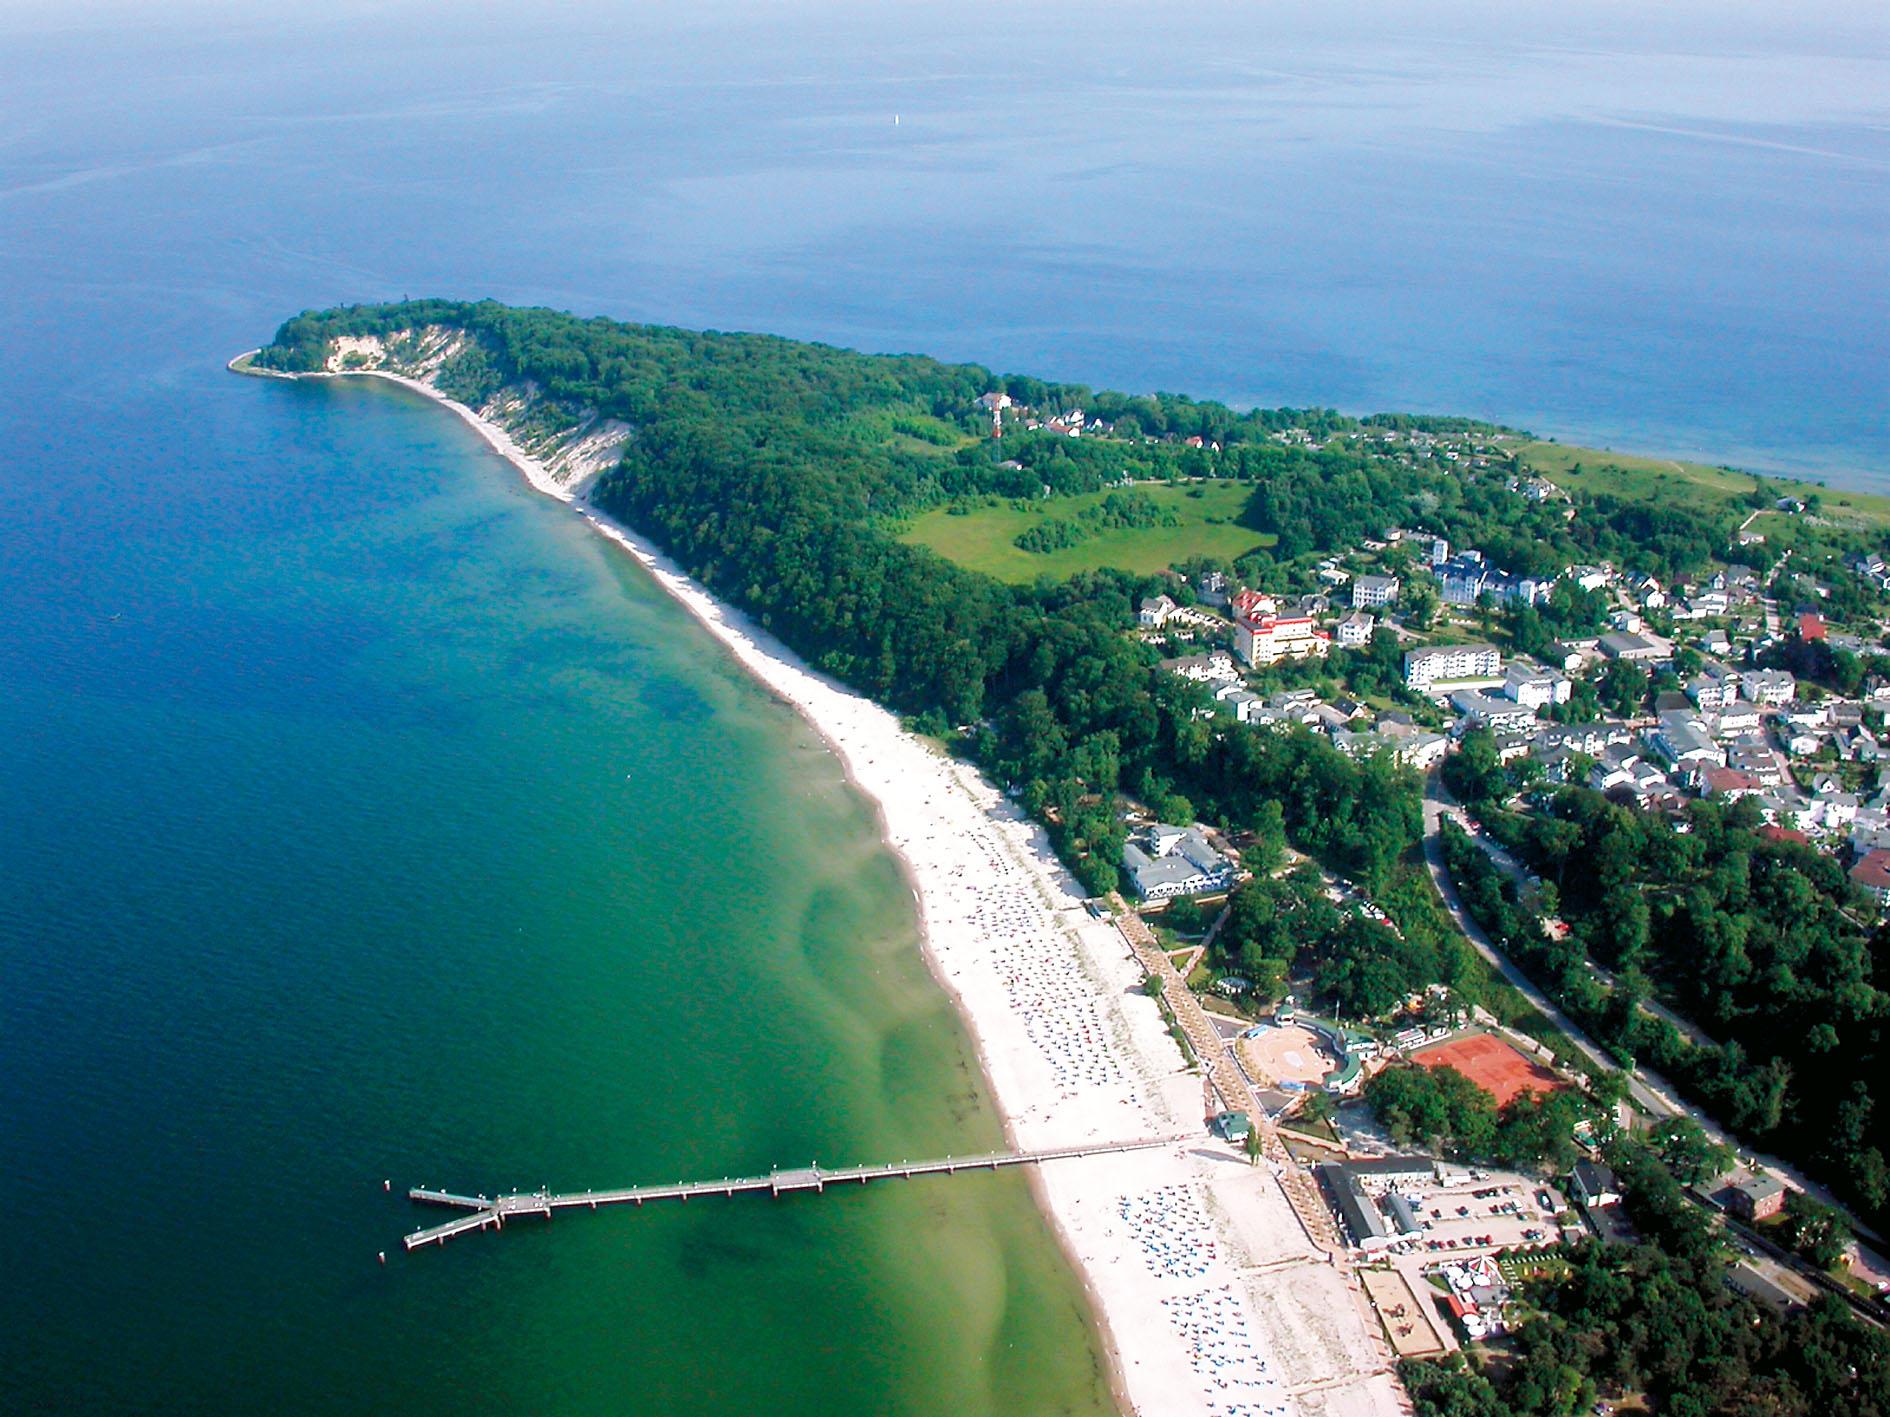 Luftbild Inselhotel-ohne-kreis